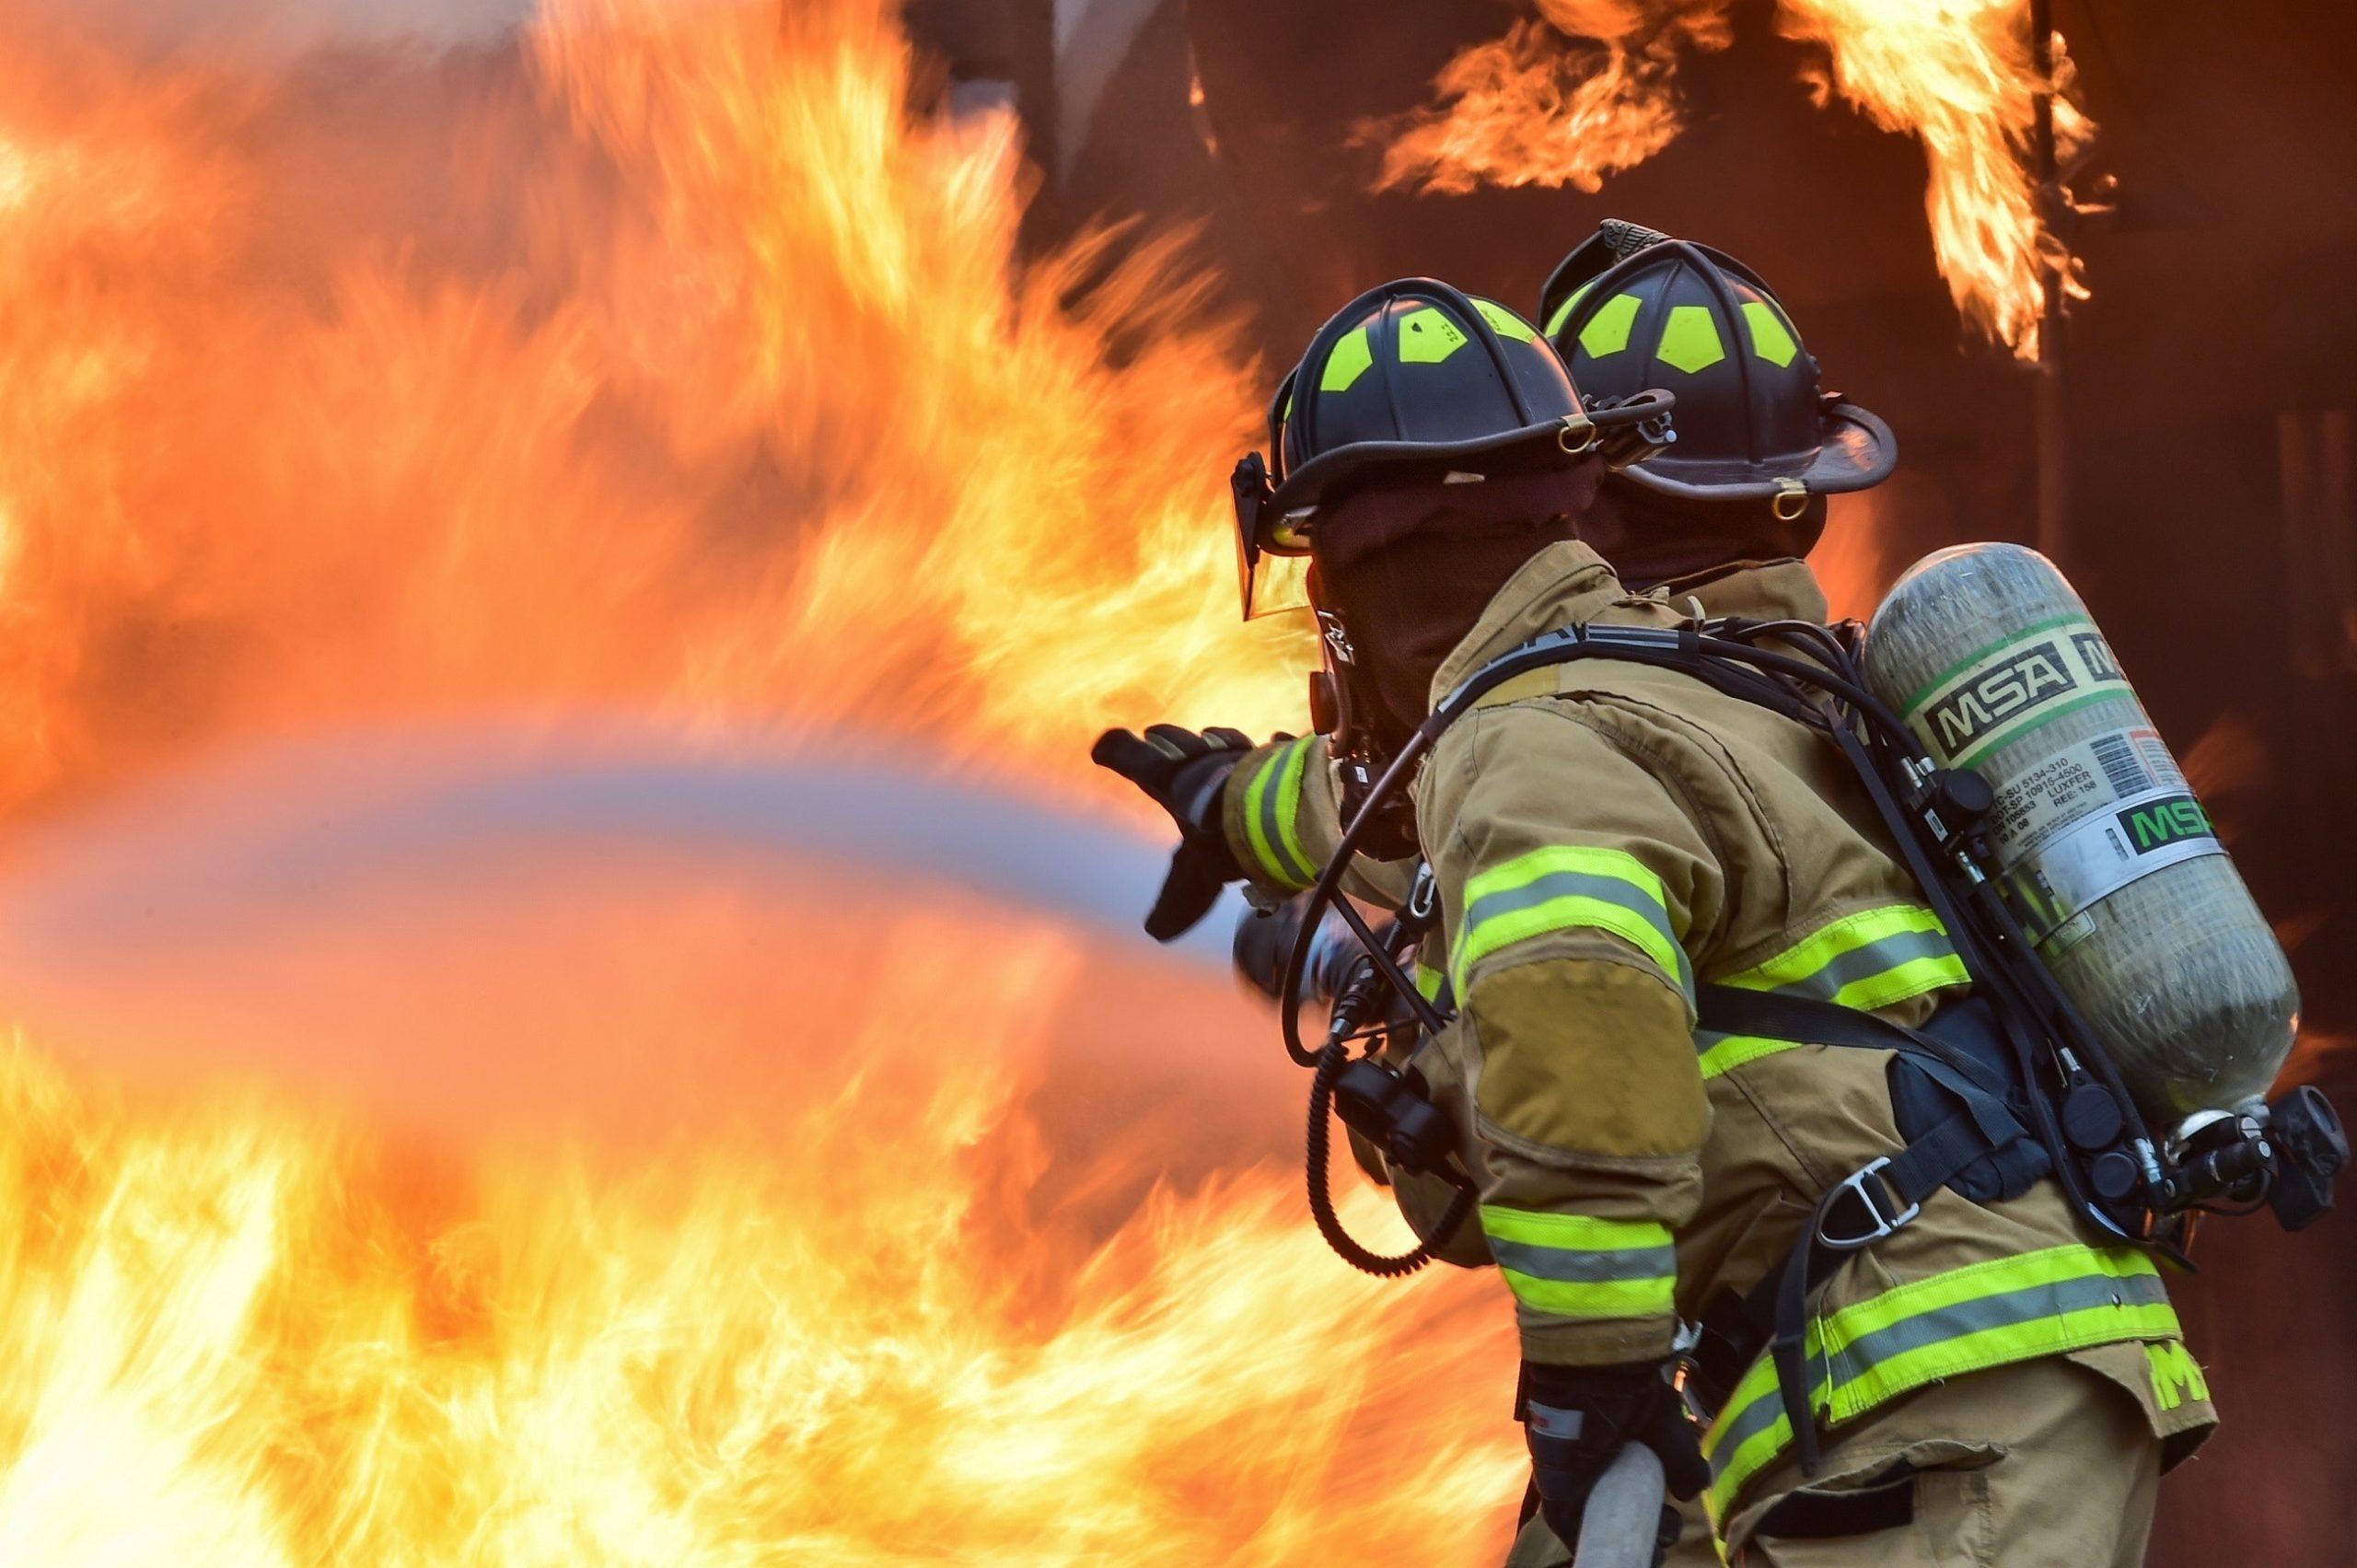 two firefighters hosing a fire